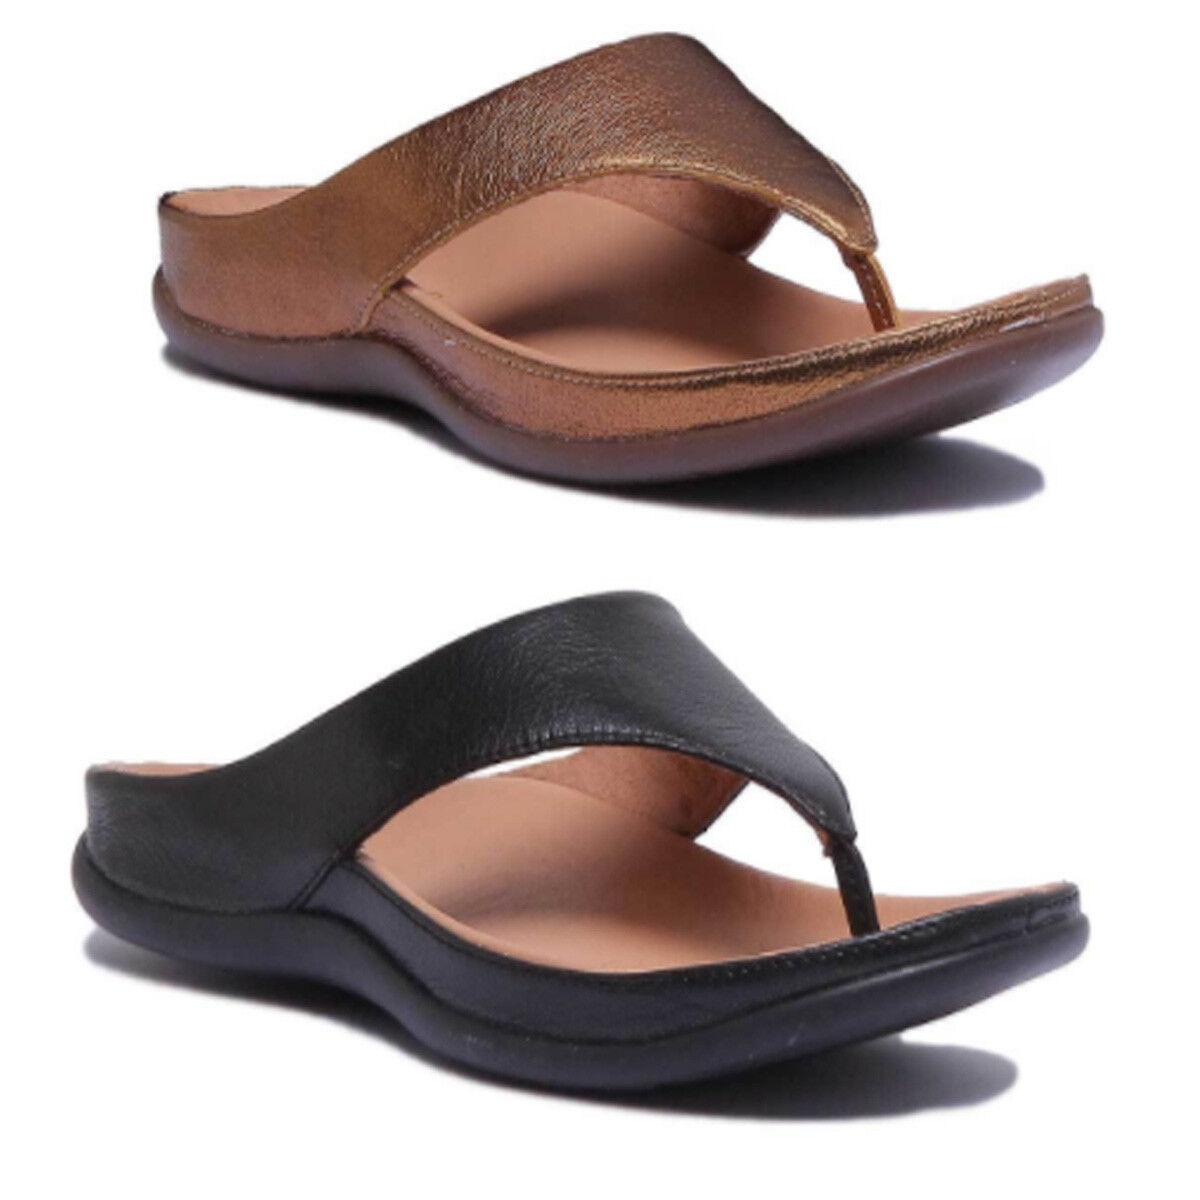 STRIVE Damen Sommer Fubbett Leder Slide Sandale Größe EU 35 - 40